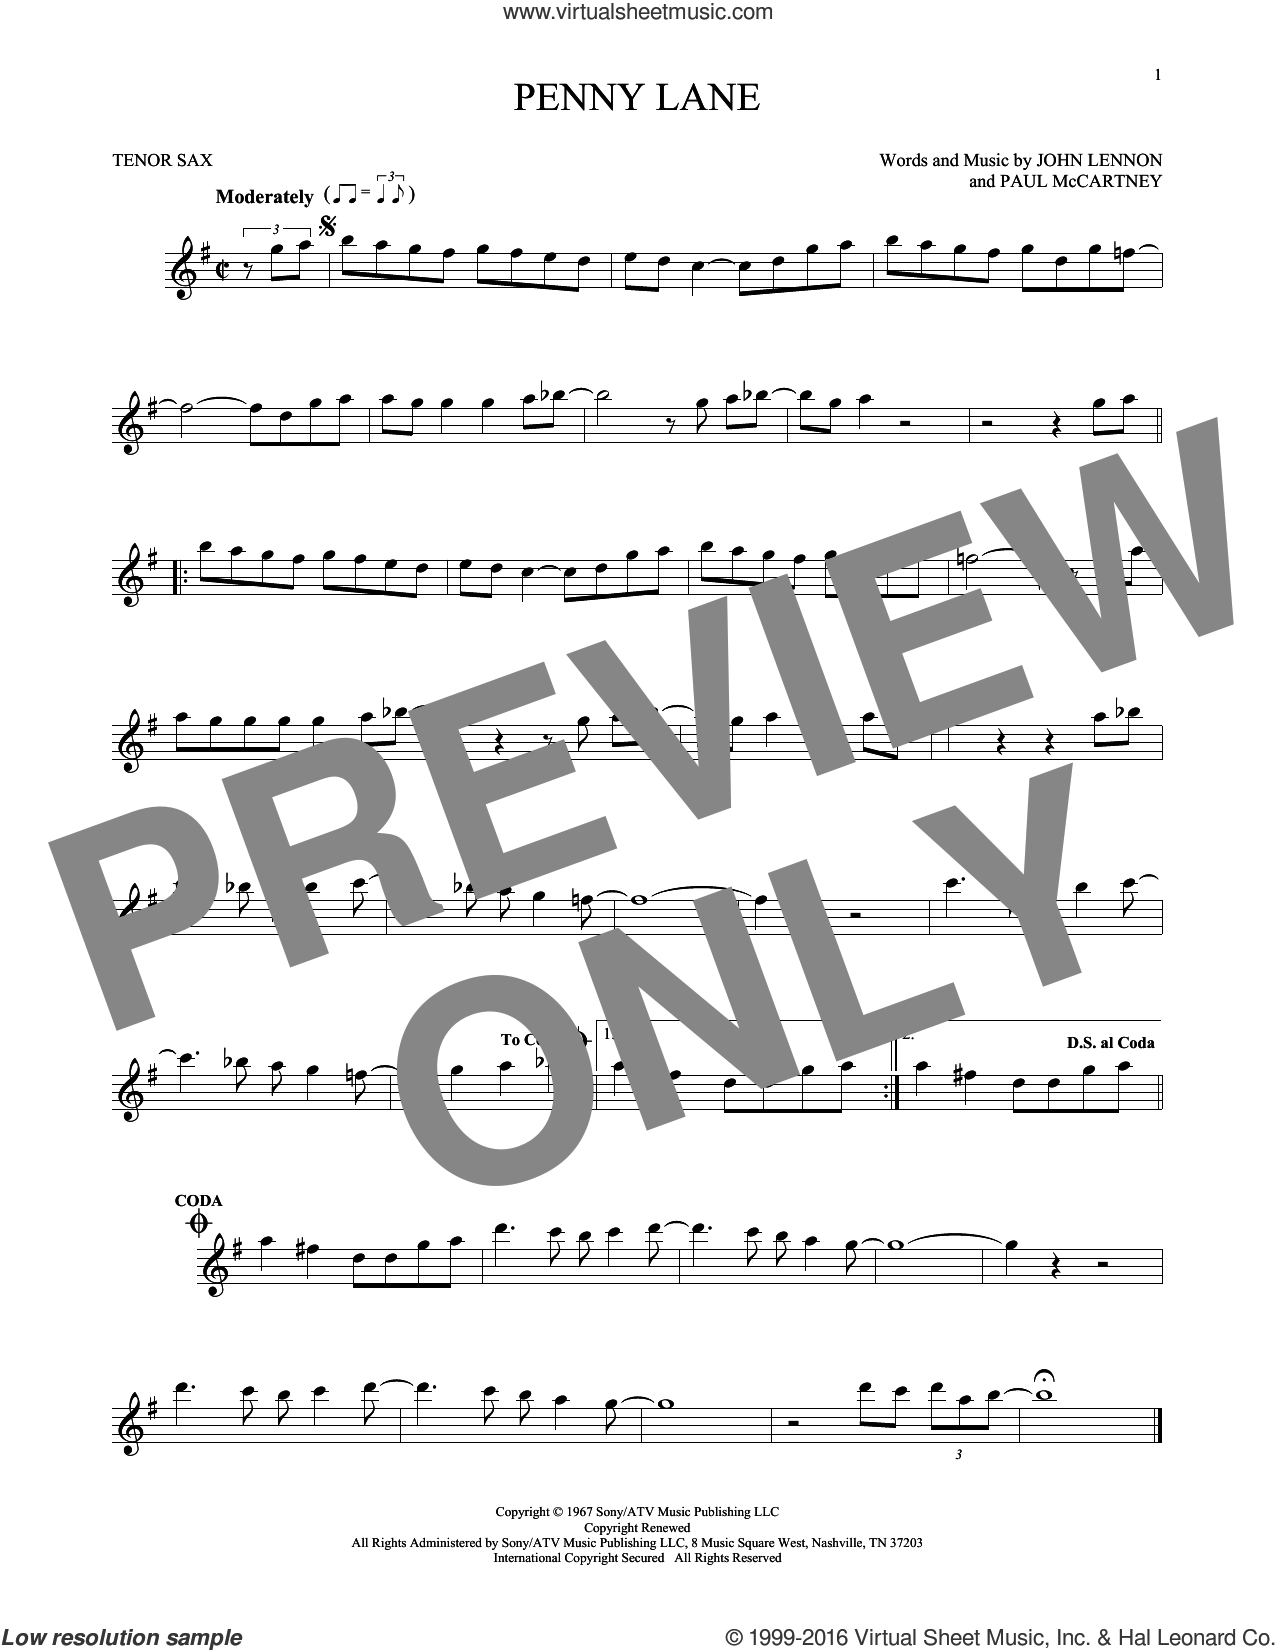 Penny Lane sheet music for tenor saxophone solo by The Beatles, John Lennon and Paul McCartney, intermediate skill level